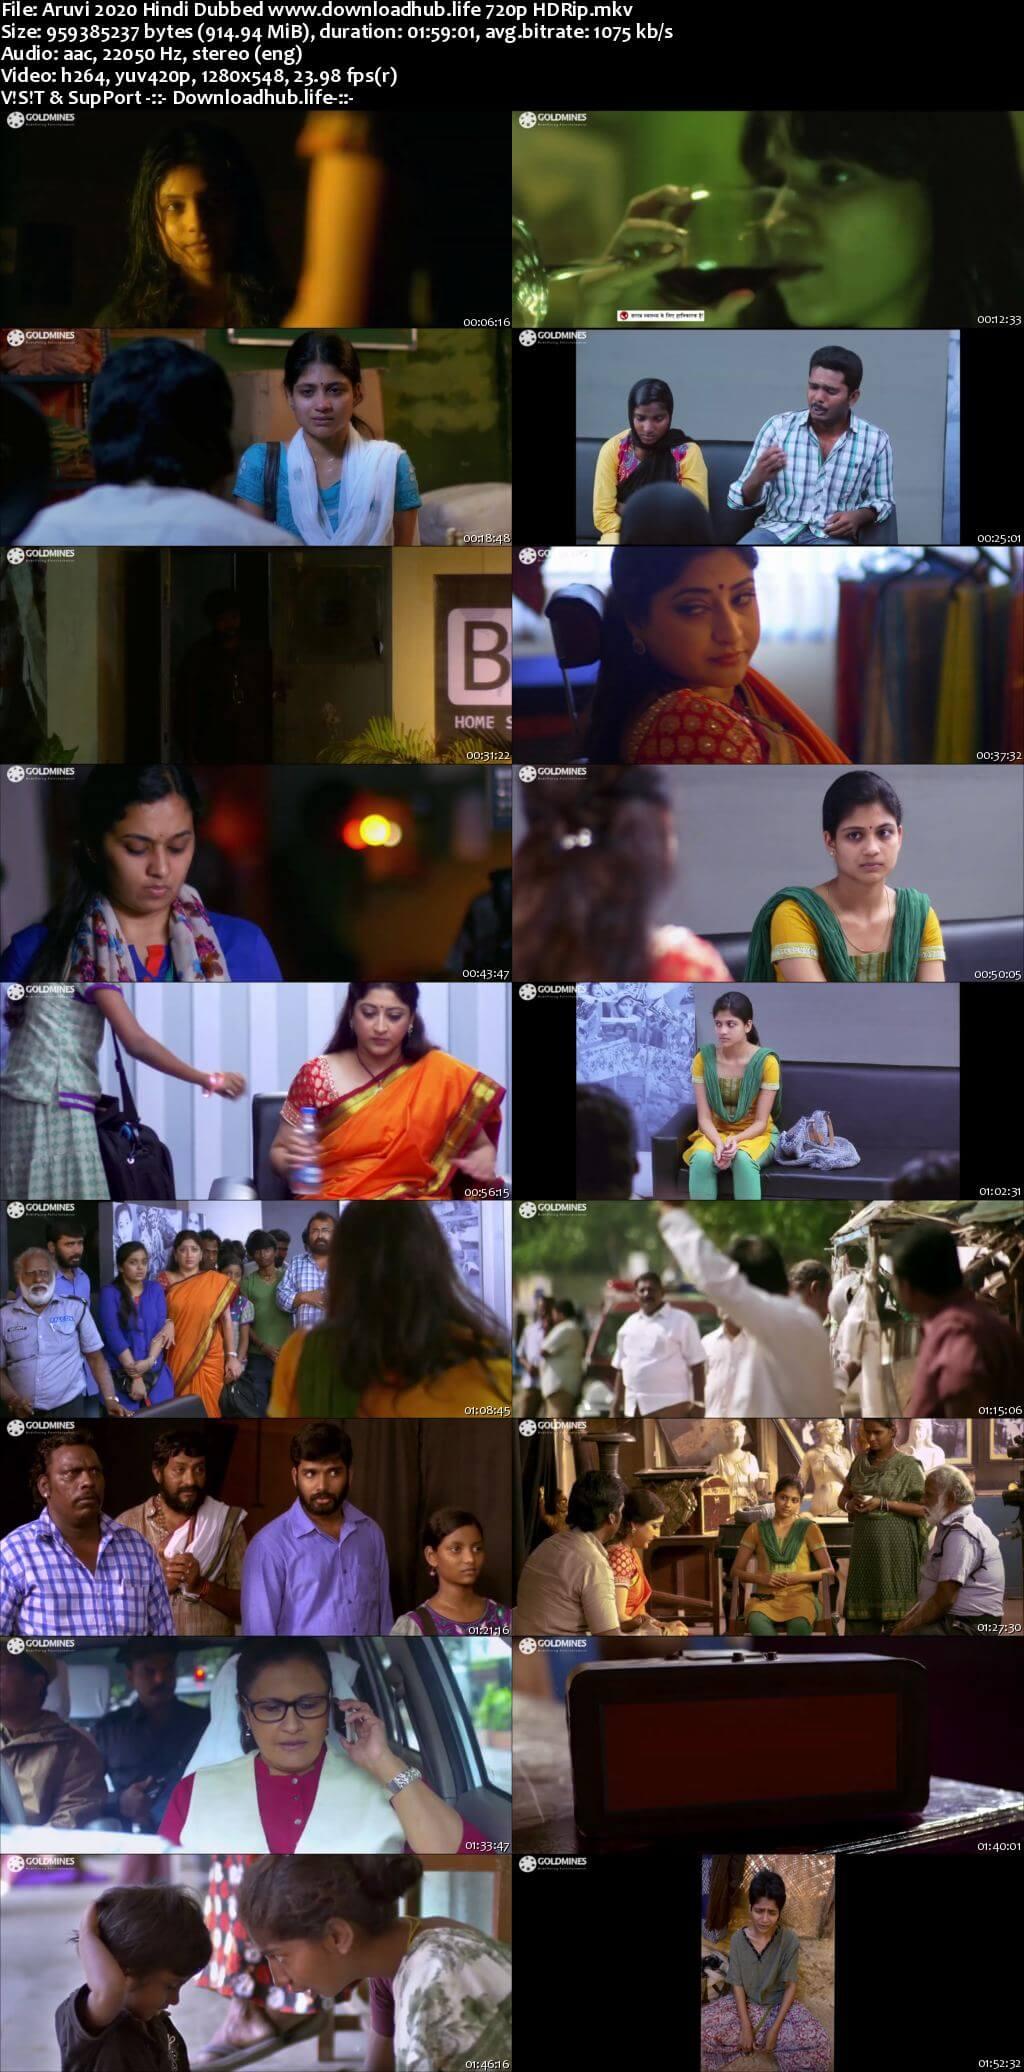 Aruvi 2020 Hindi Dubbed 720p HDRip x264